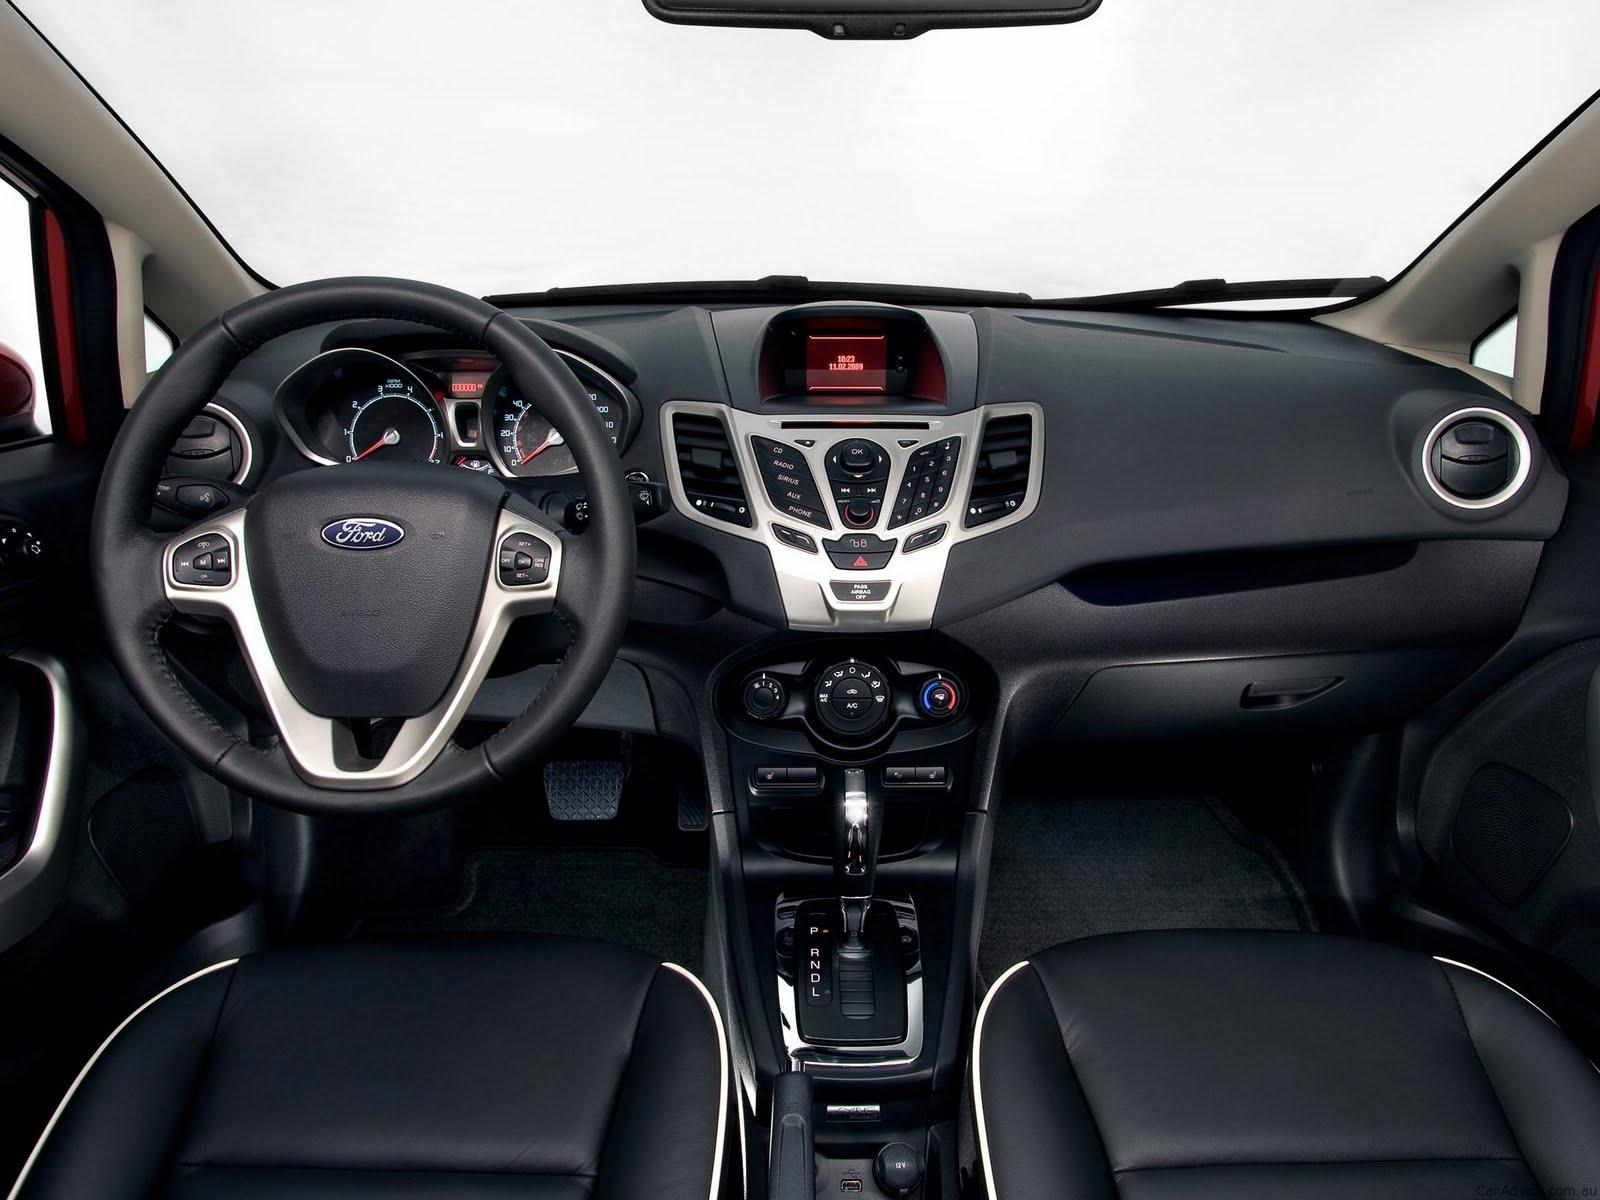 2011 ford fiesta sedan price